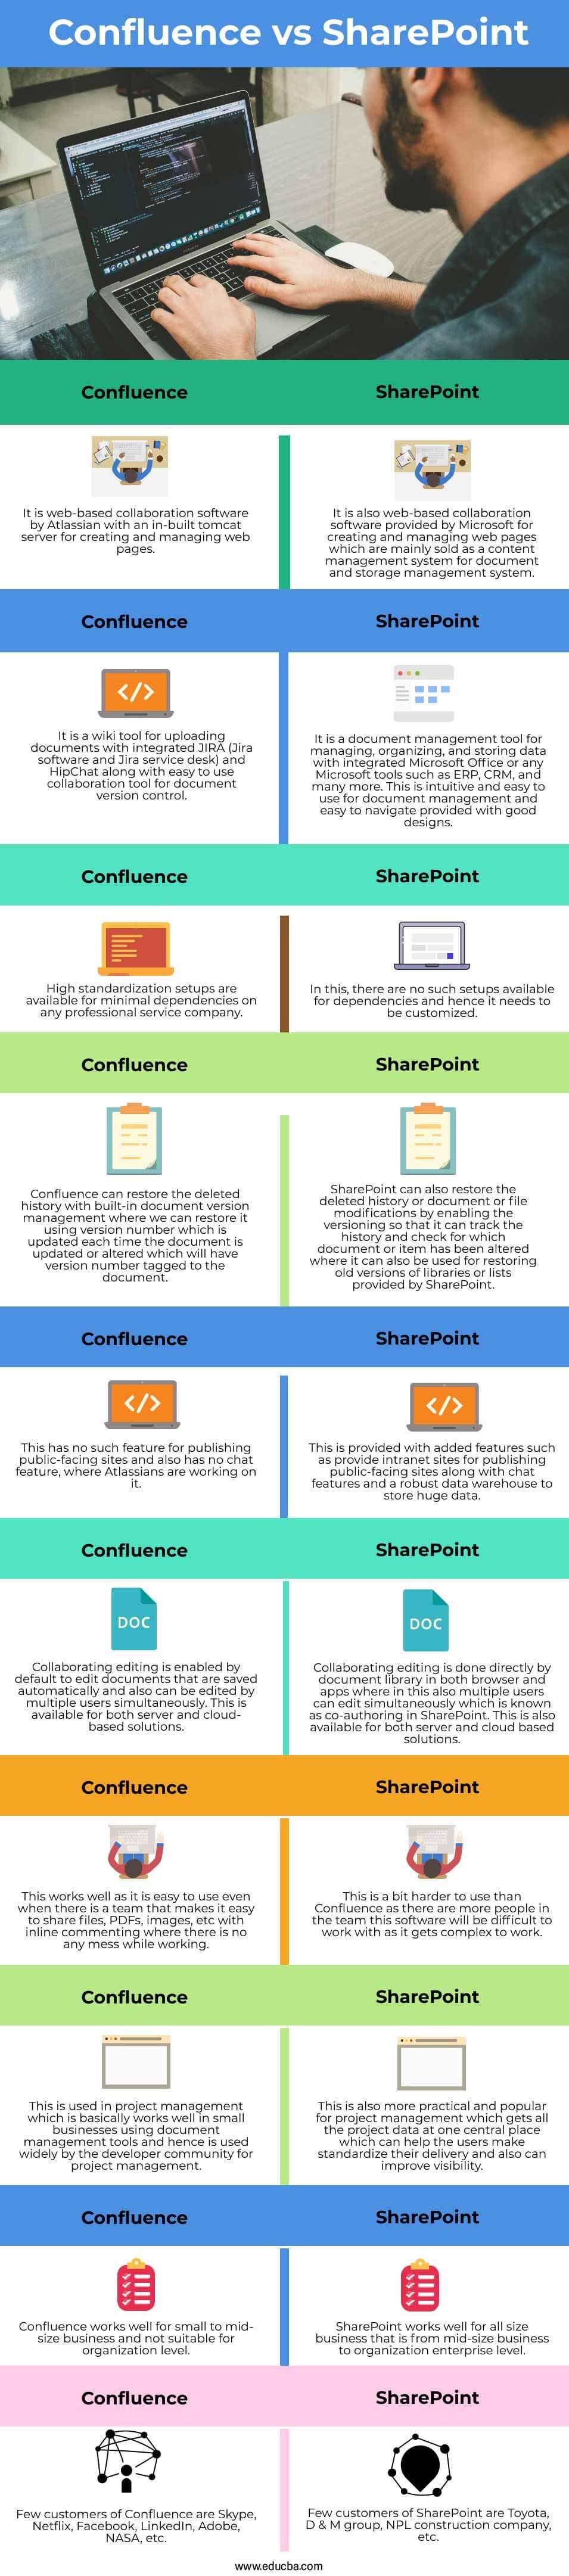 Confluence-vs-SharePoint-info